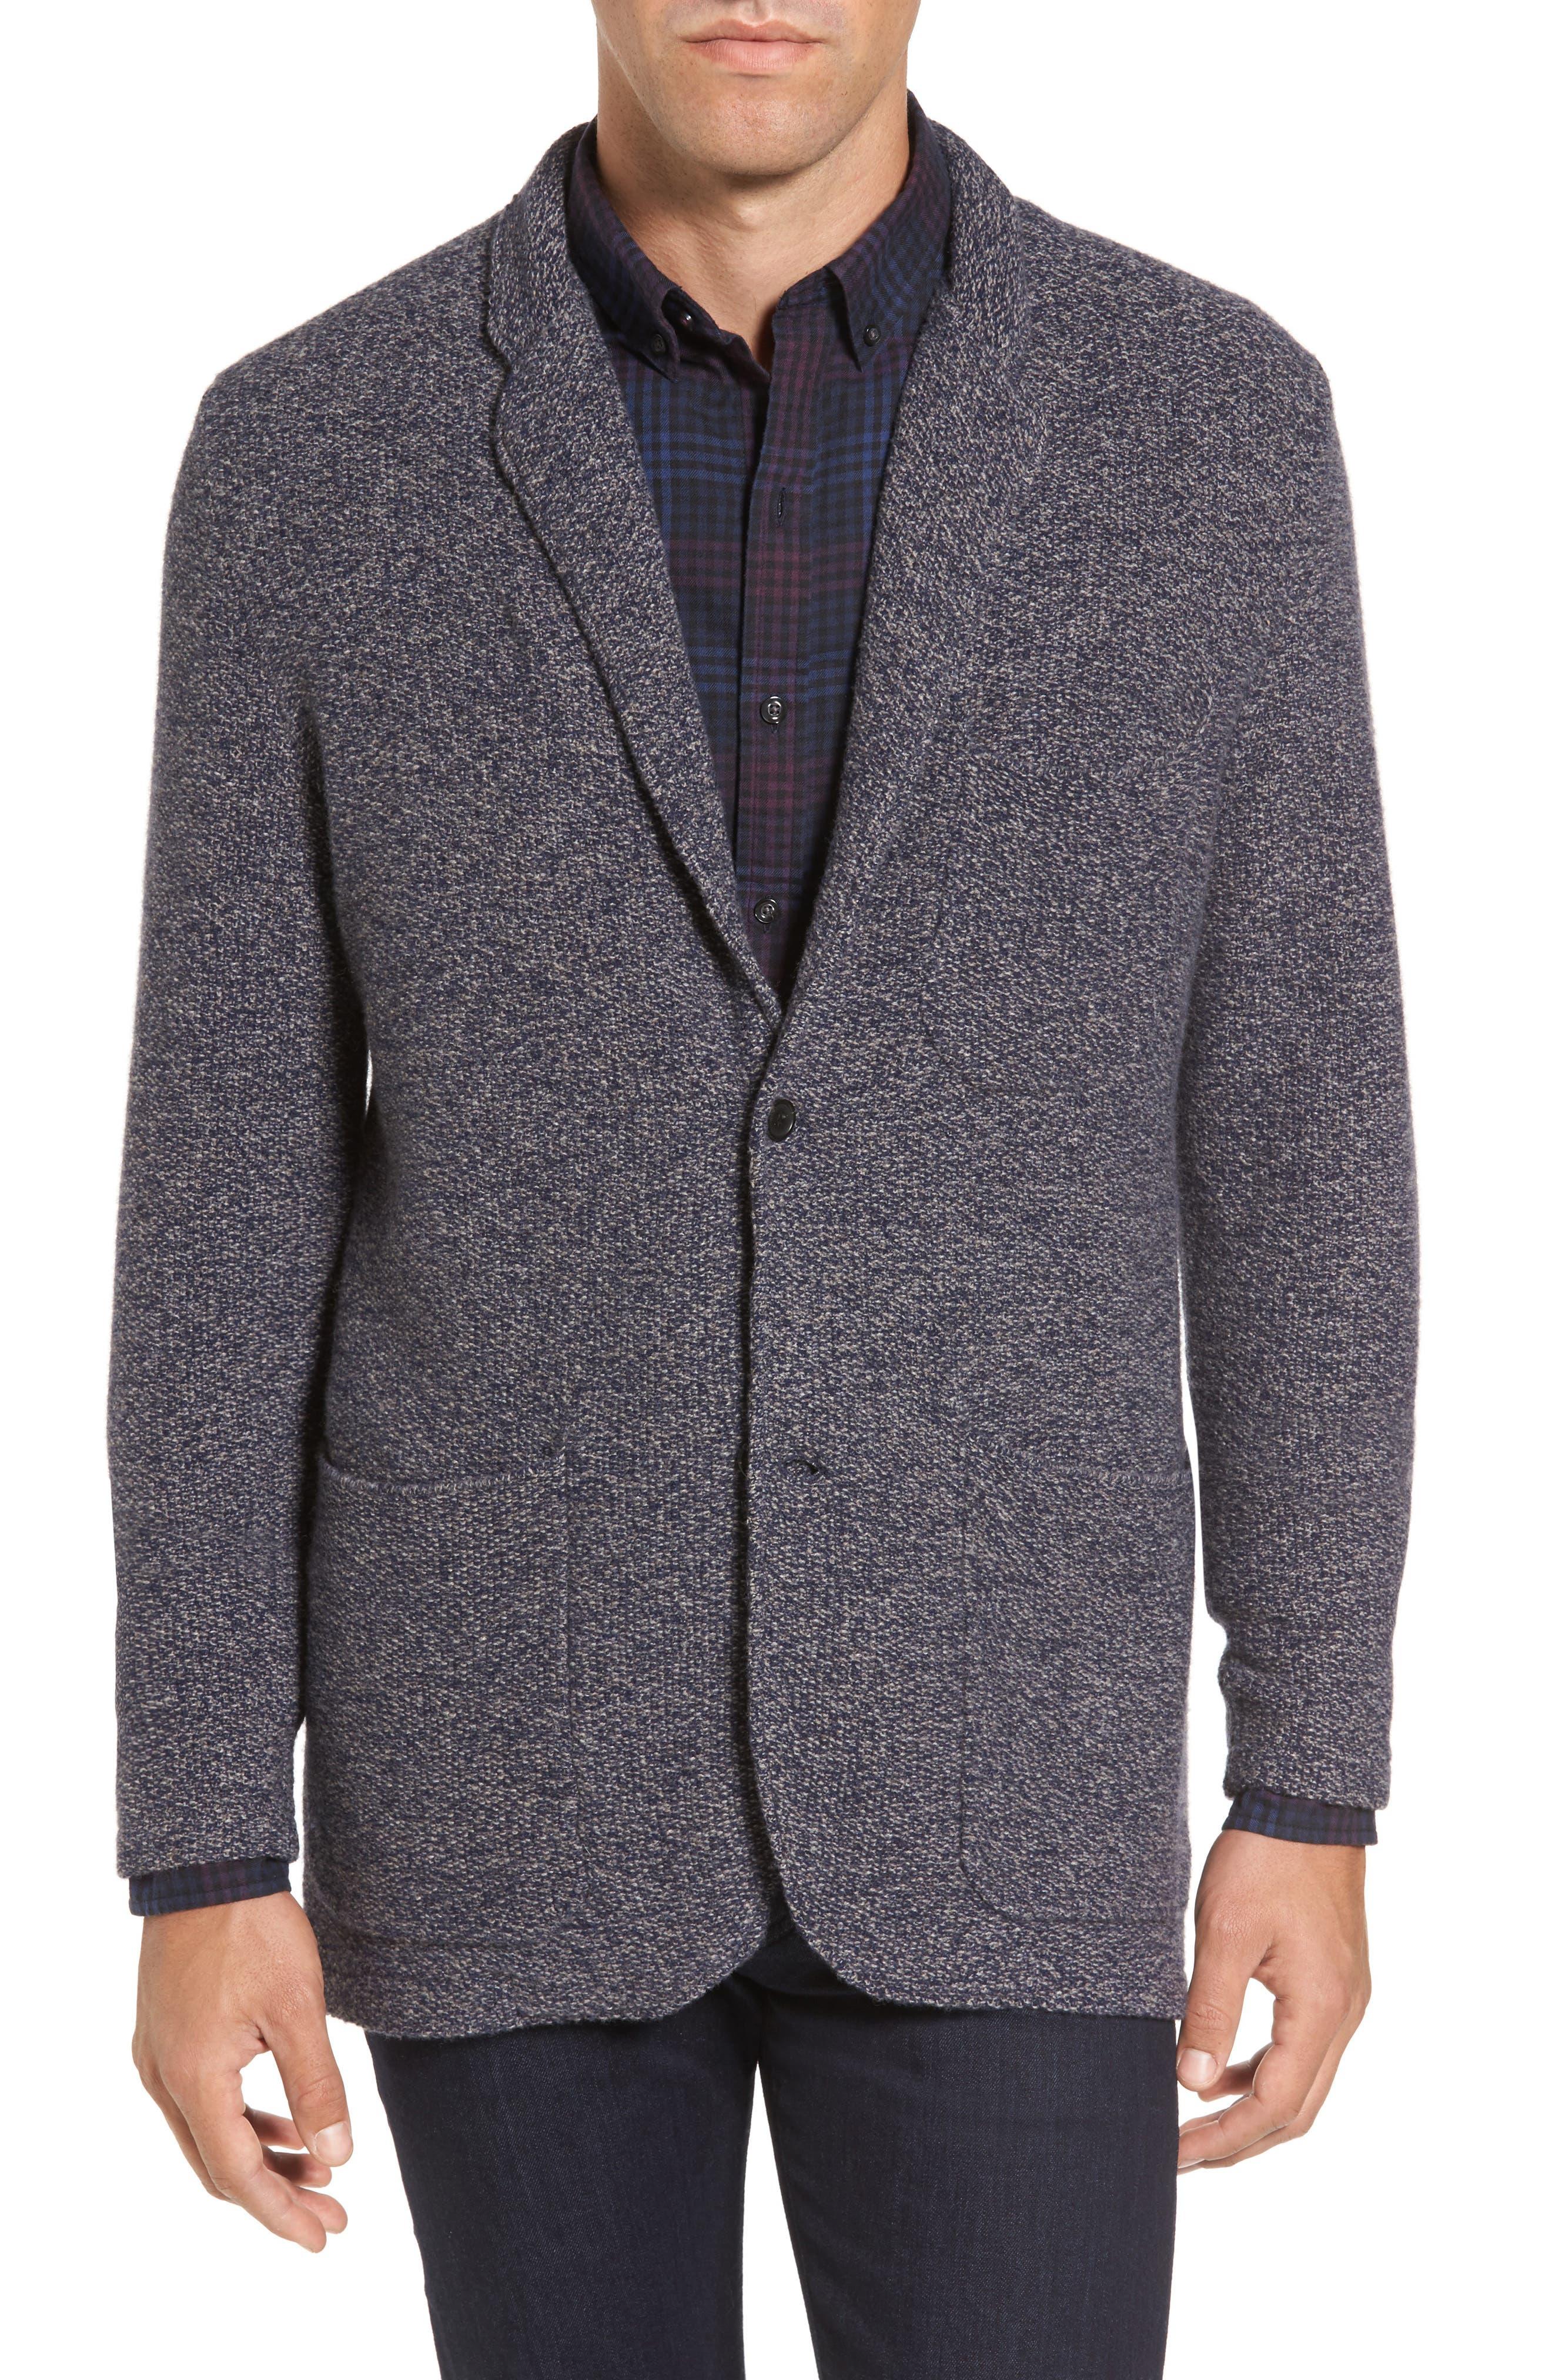 Main Image - Michael Bastian Deconstructed Merino & Yak Wool Sweater Jacket